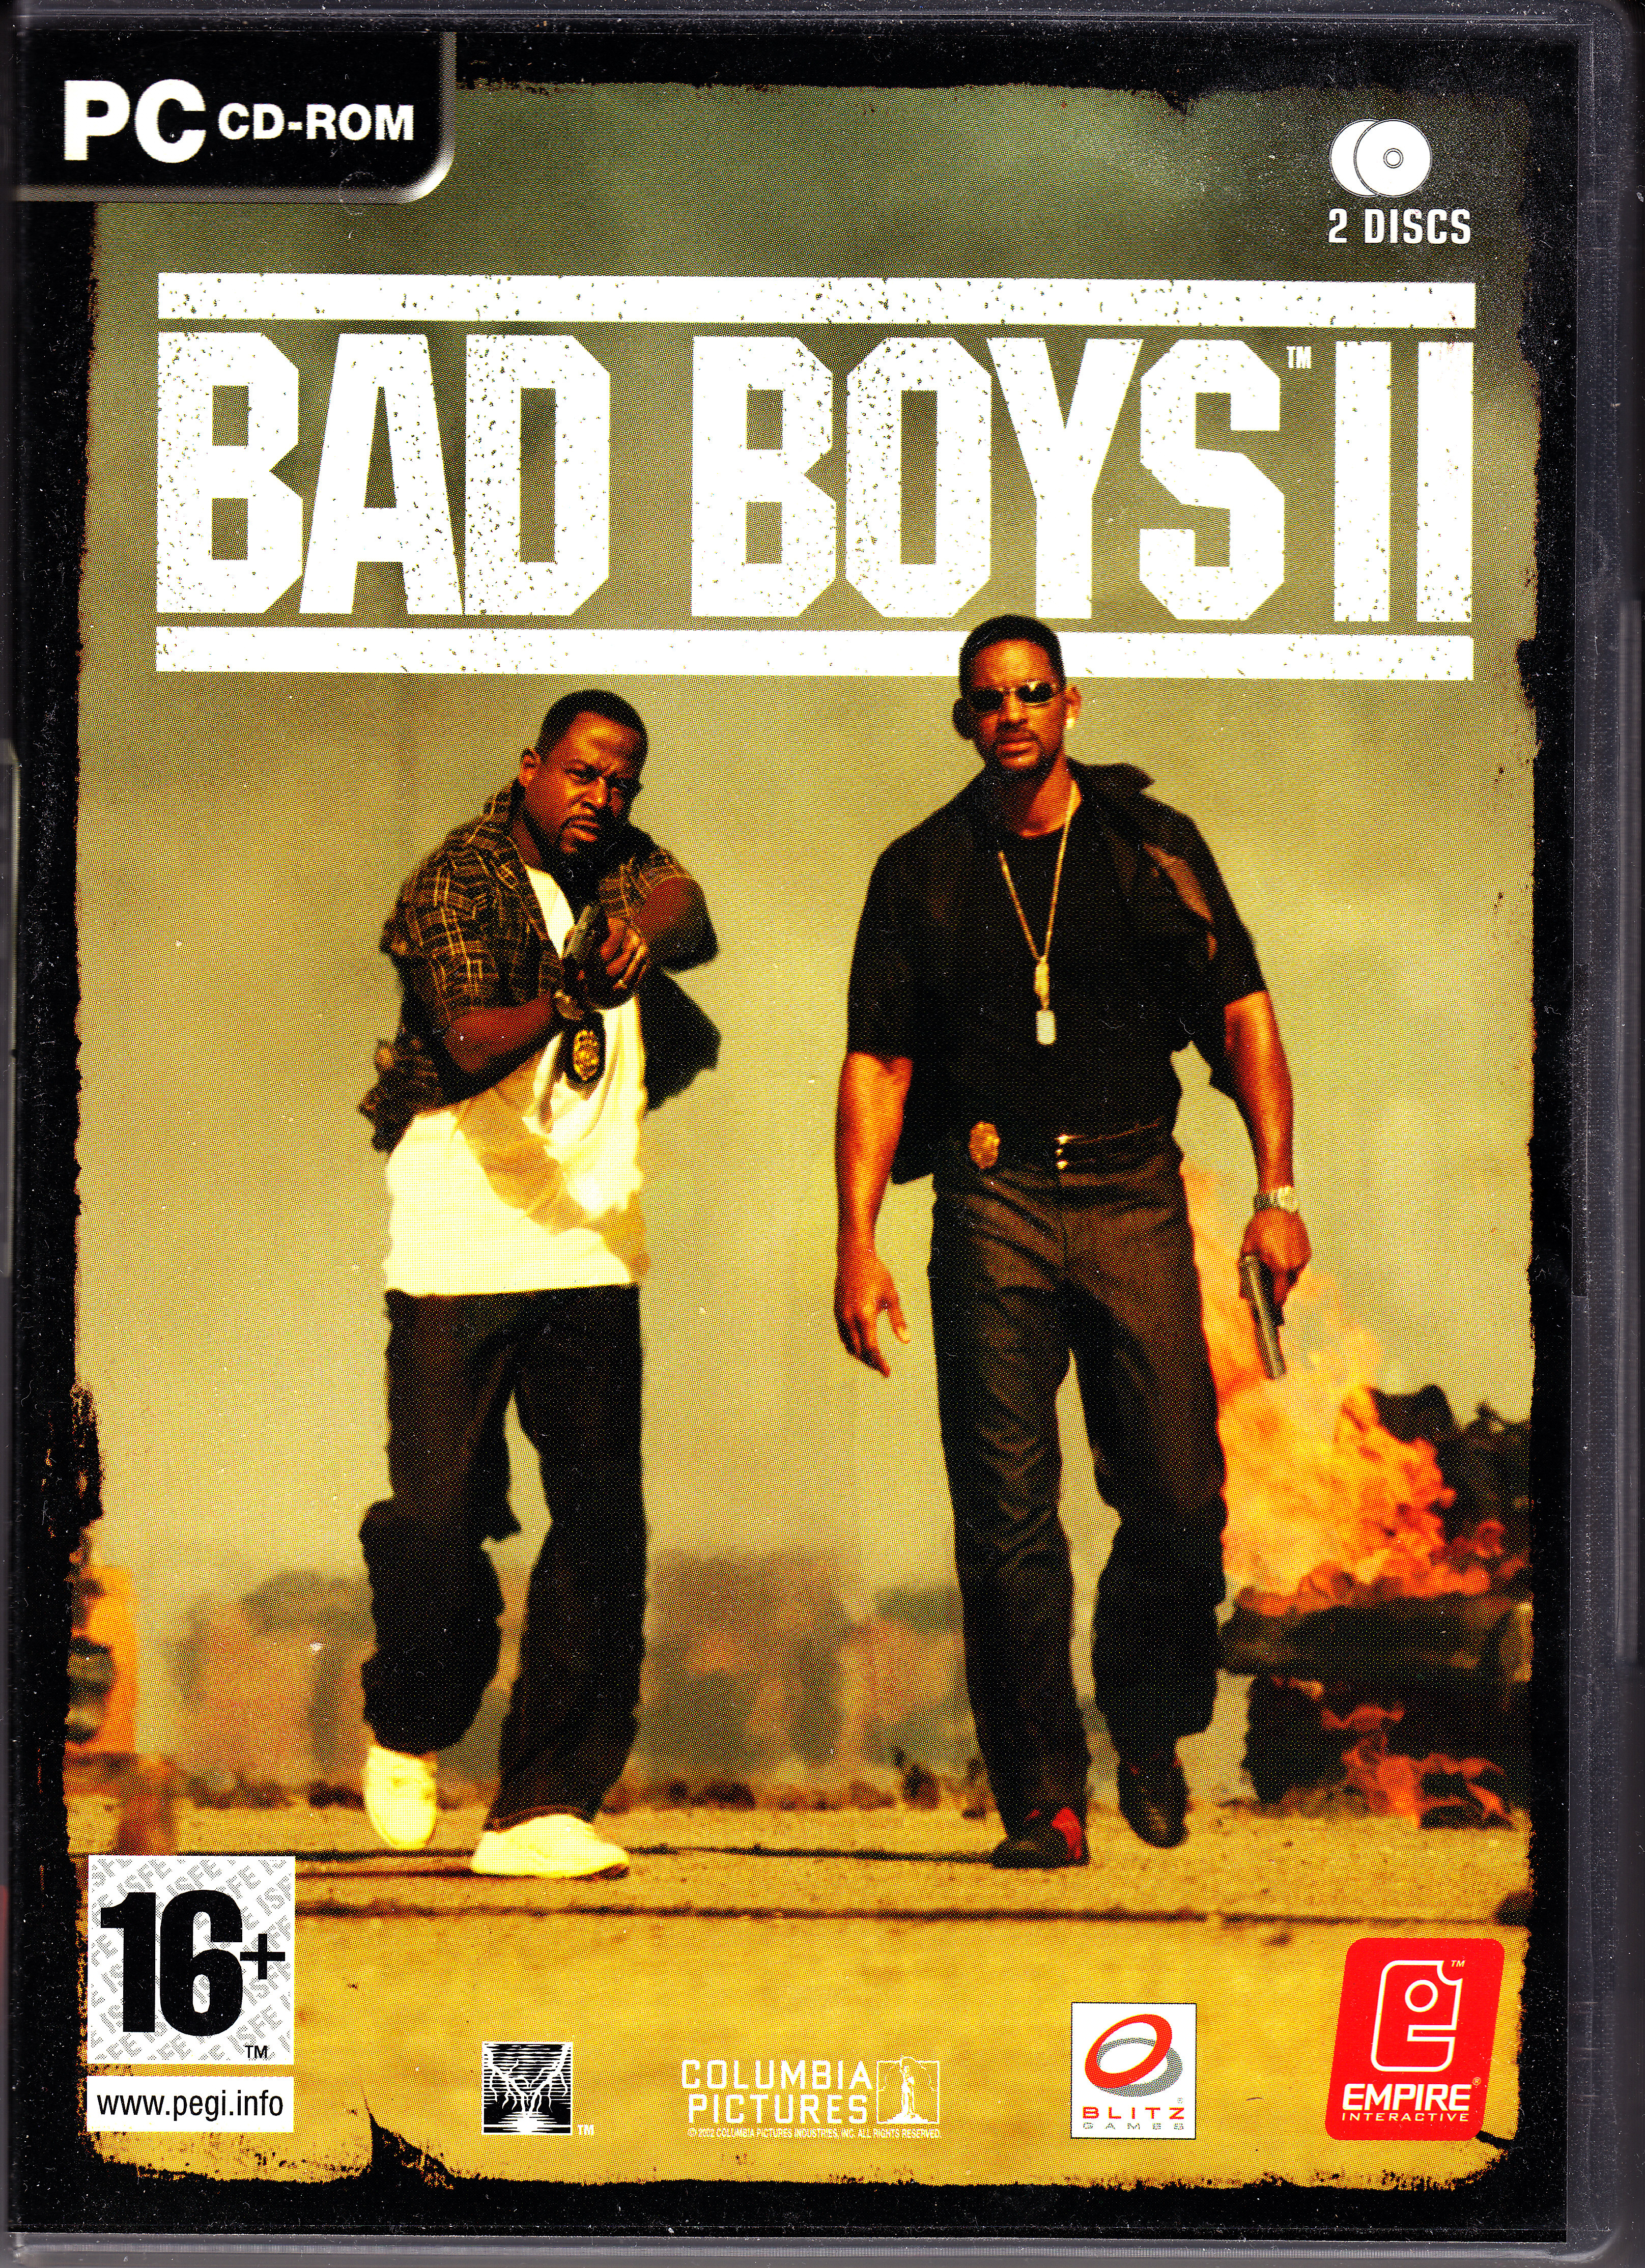 Bad boys date scene in Brisbane